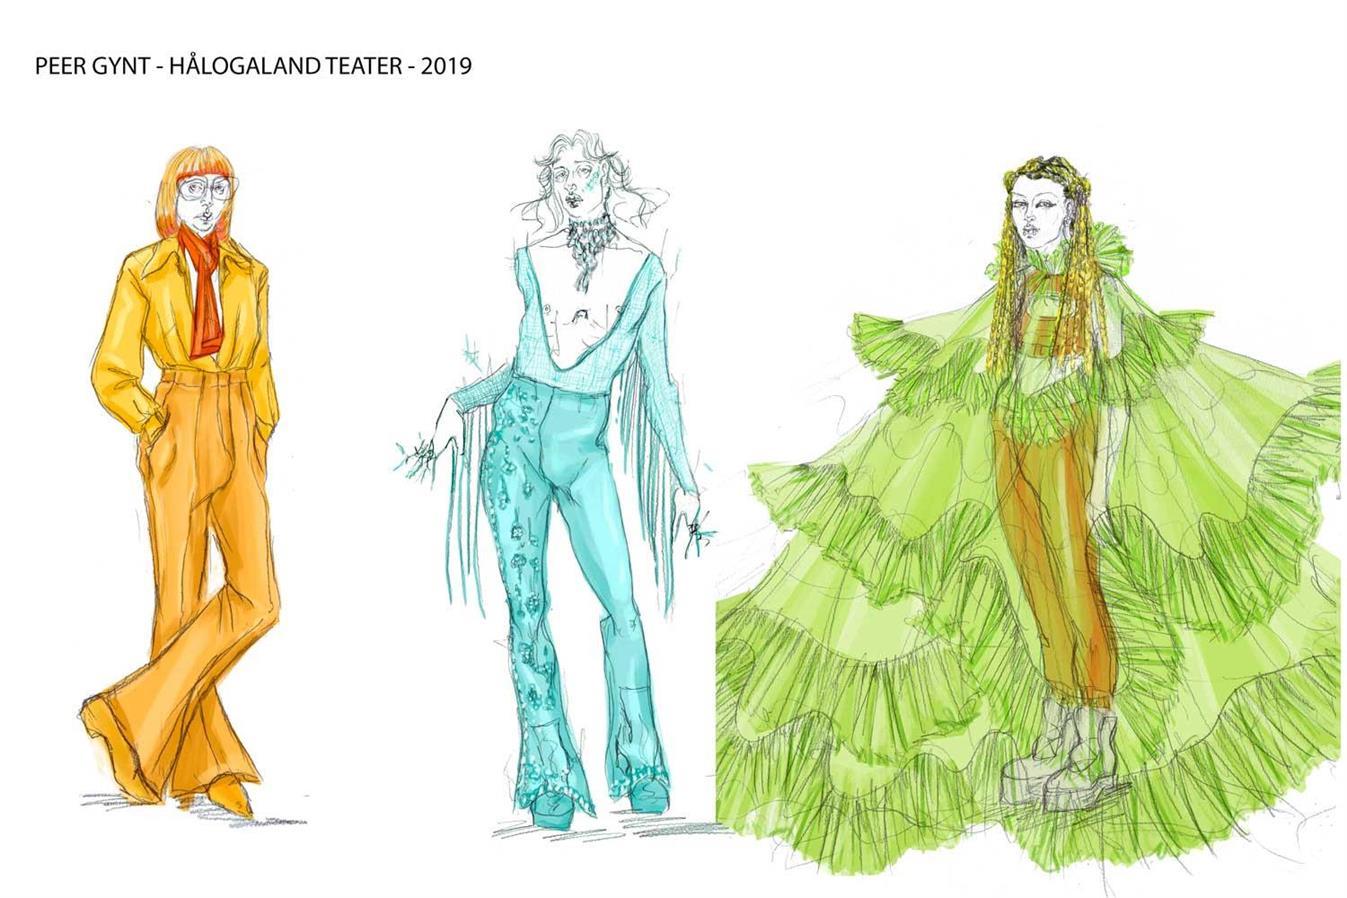 Peer Gynt - Hålogaland Teater - Director: Eline Arbo - Costume Design: Christina Lovery